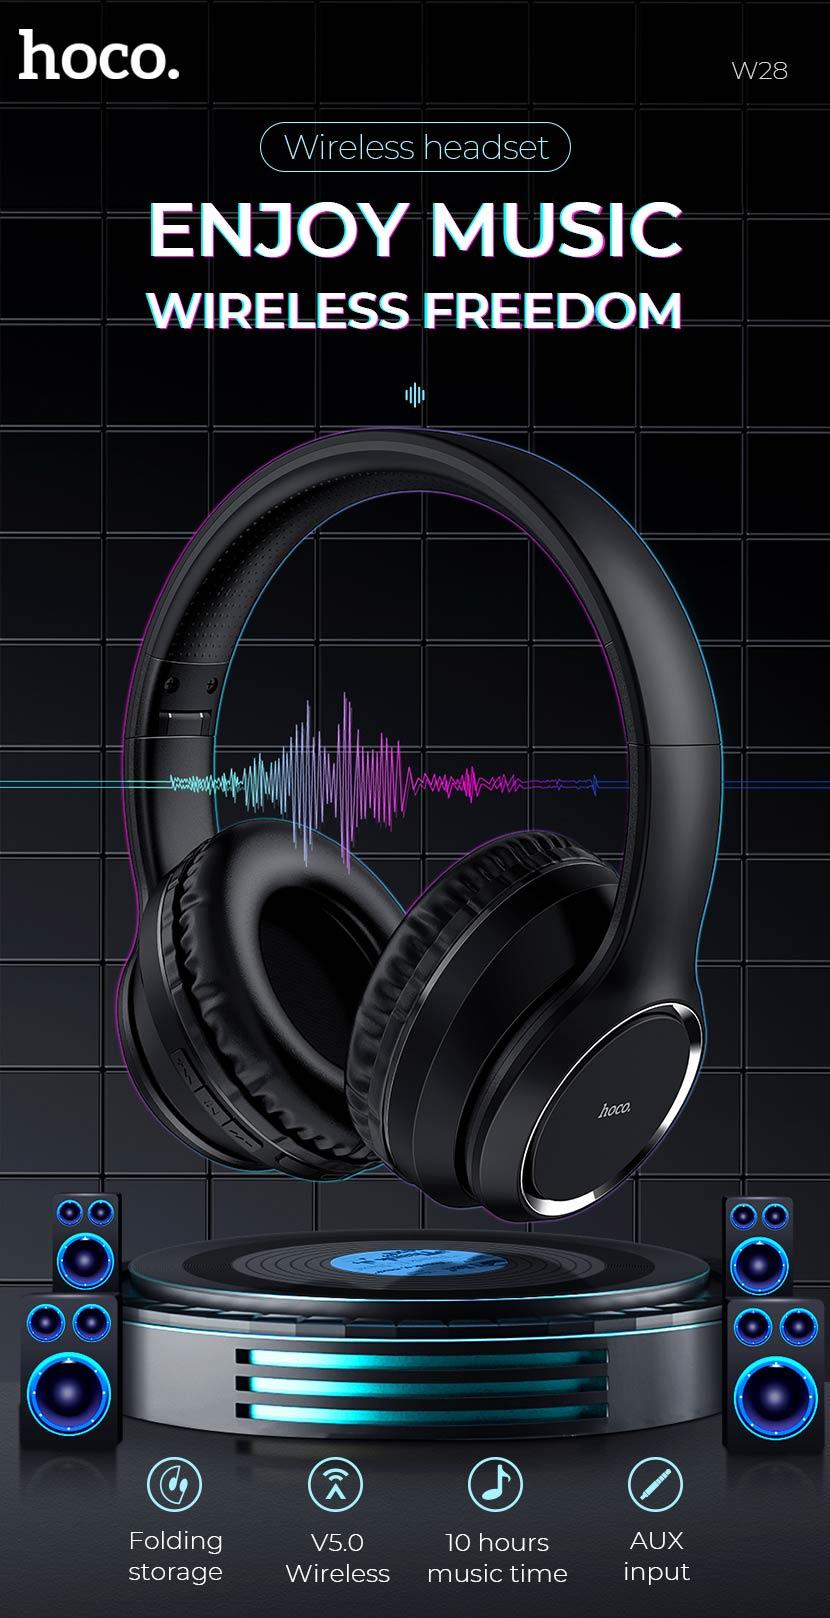 hoco news w28 journey wireless headphones freedom en